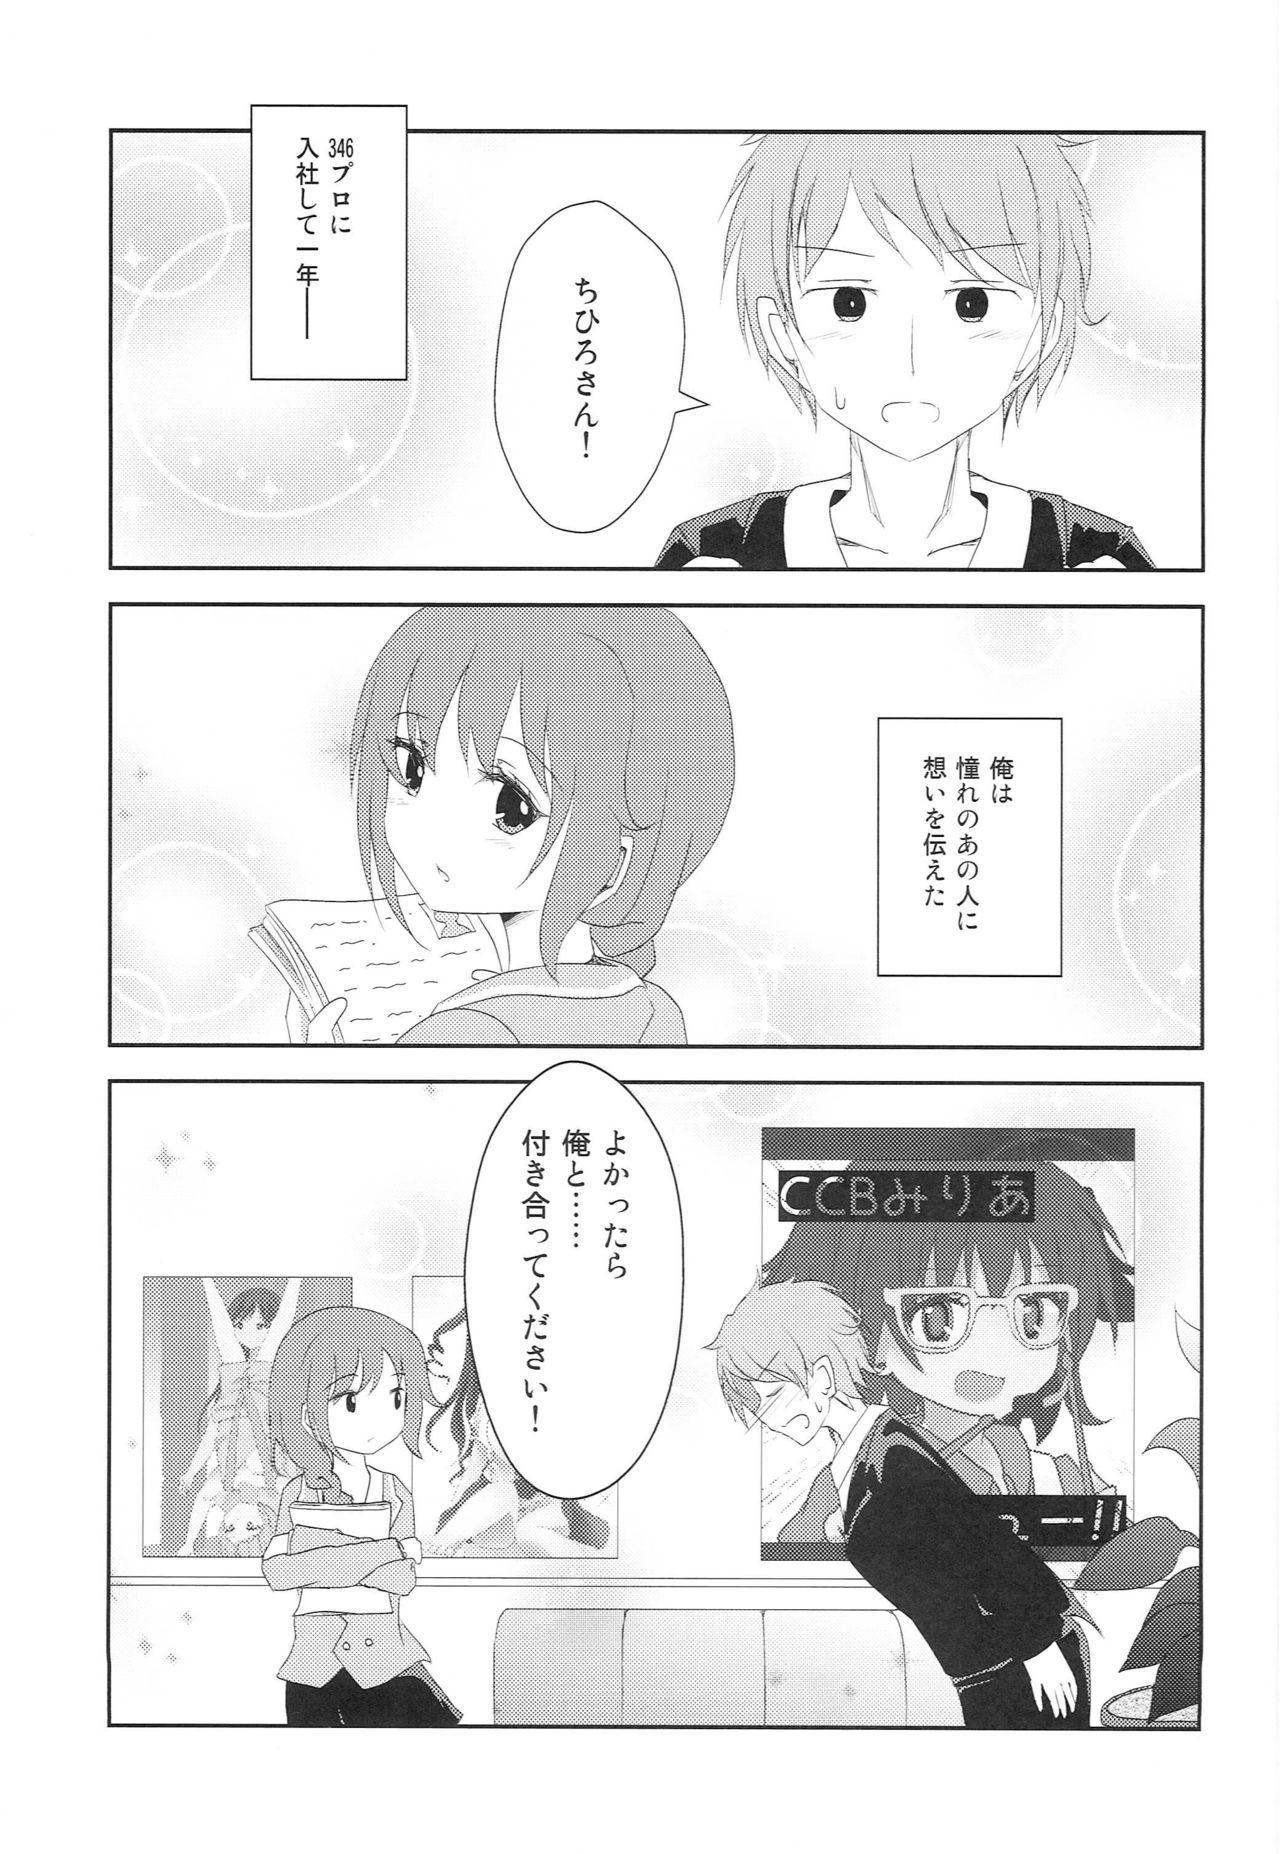 (CINDERELLA FESTIV@L) [Ribbon Enikki+ (Mickeysmith)] Chihiro-san ni Kokuhaku Shitara, Idol-tachi ni Mawasaretanda ga. (THE IDOLM@STER CINDERELLA GIRLS) 1